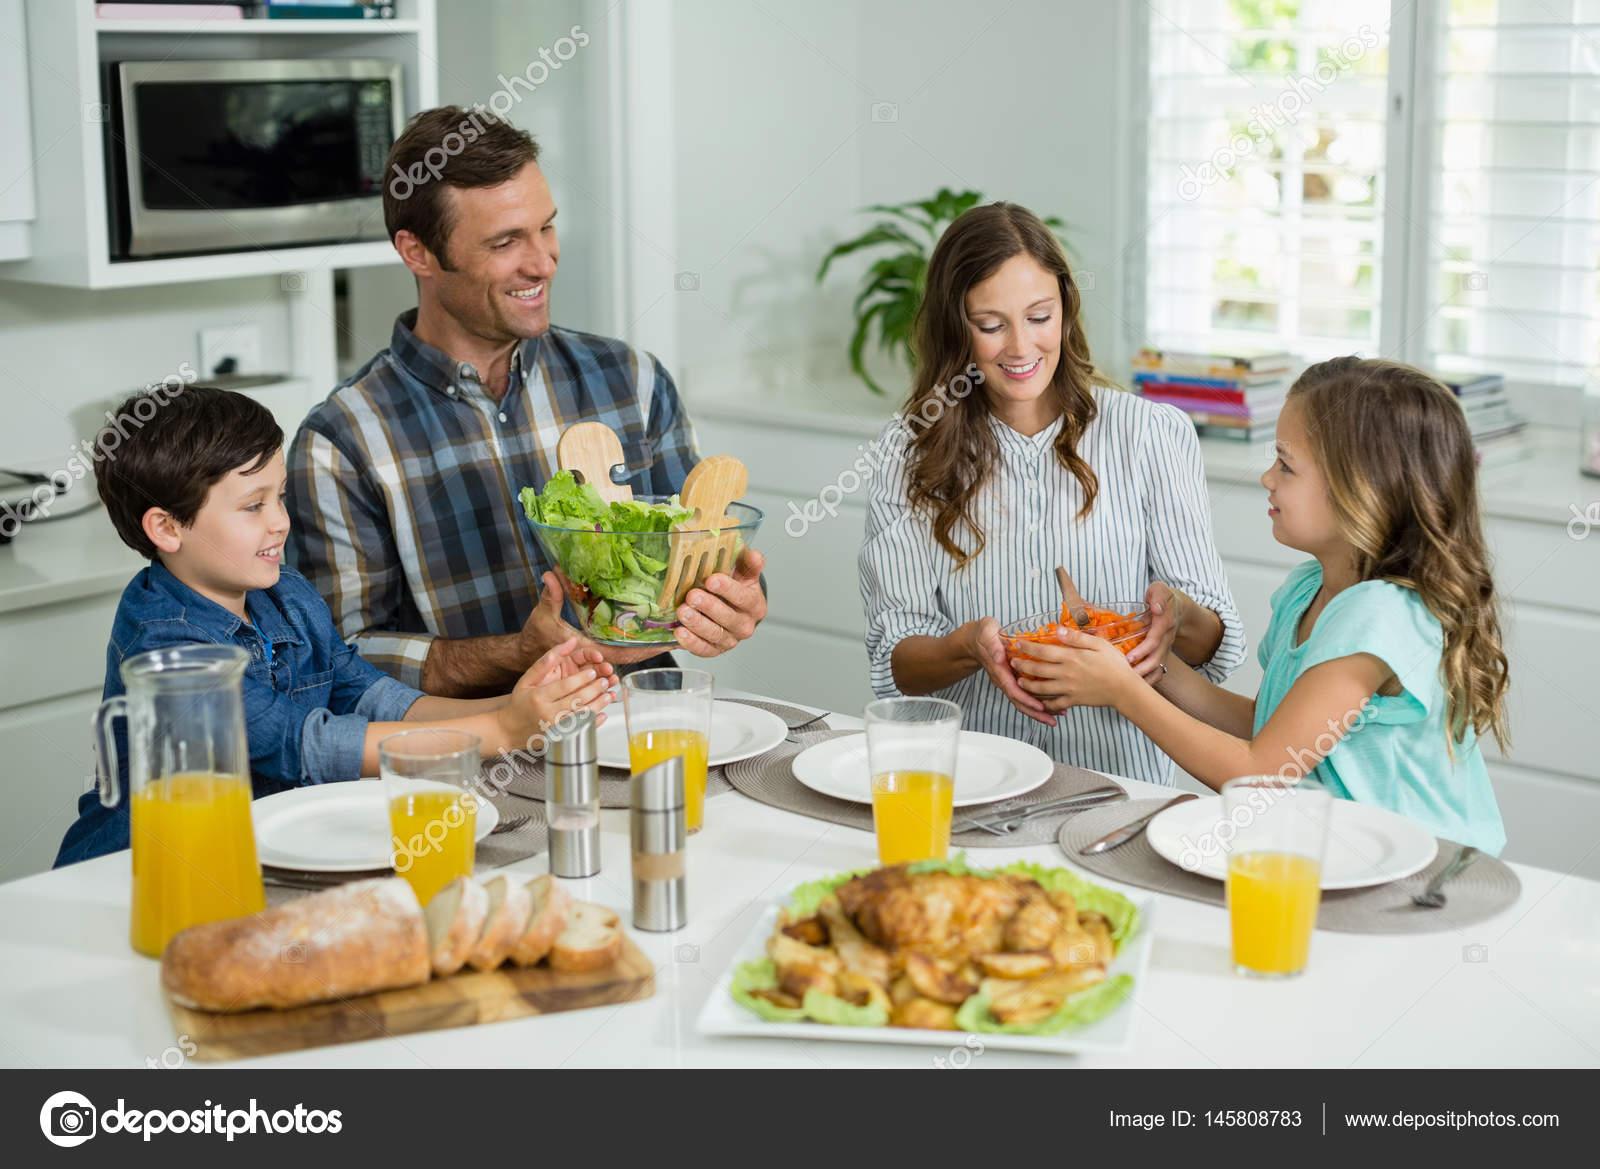 Fam lia almo ando juntos na mesa de jantar fotografias - El comedor de familia ...